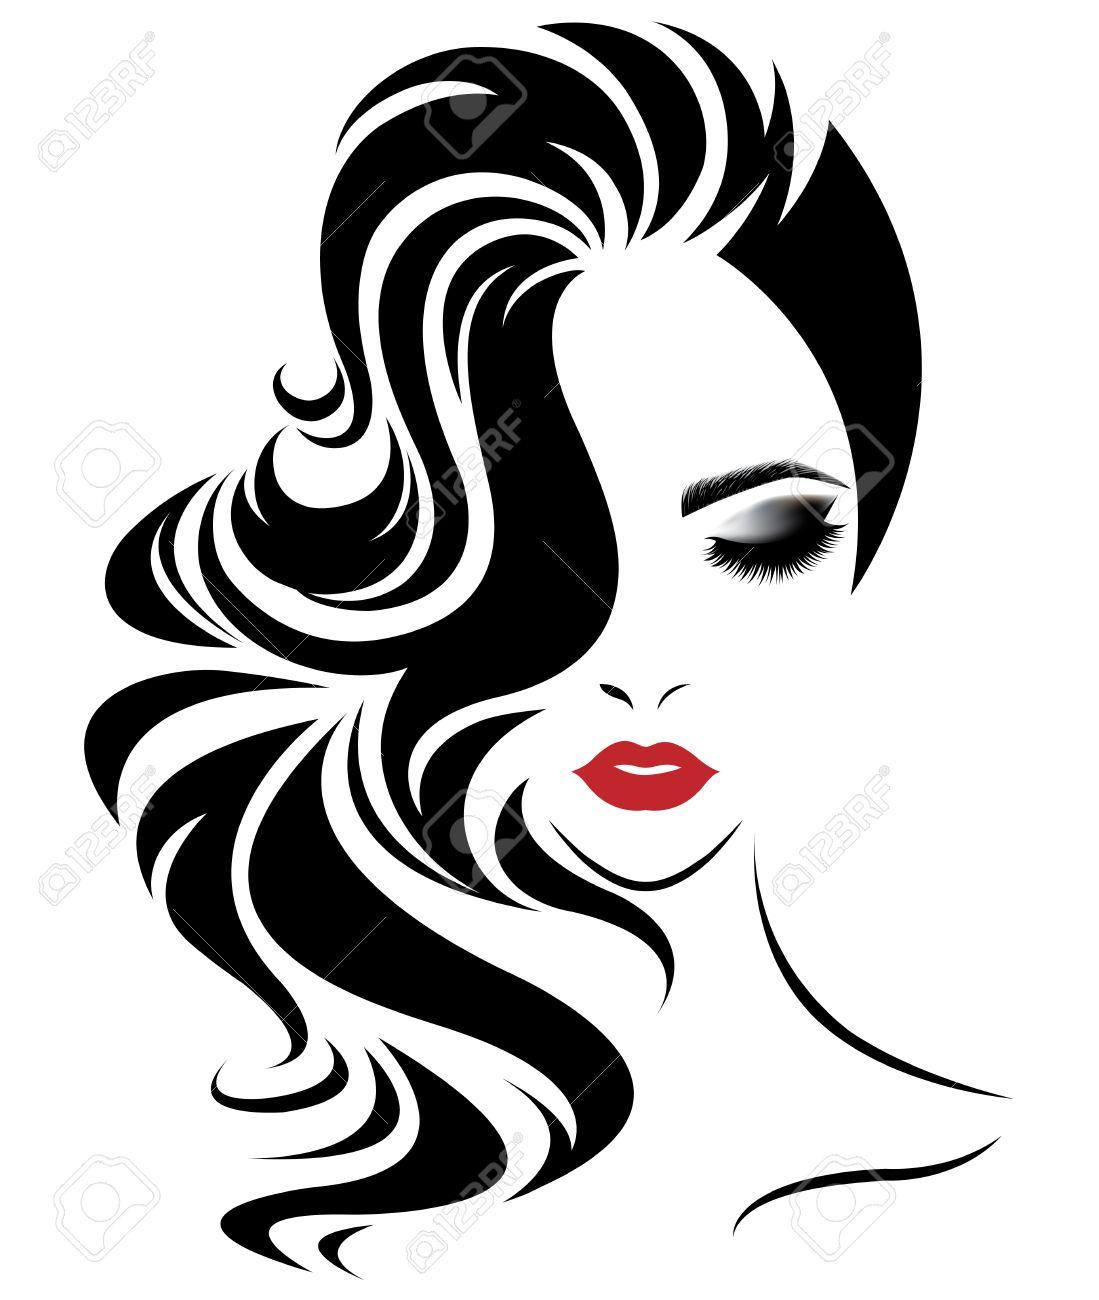 illustration of women long hair style icon, logo women face on white background, vector - 64872027